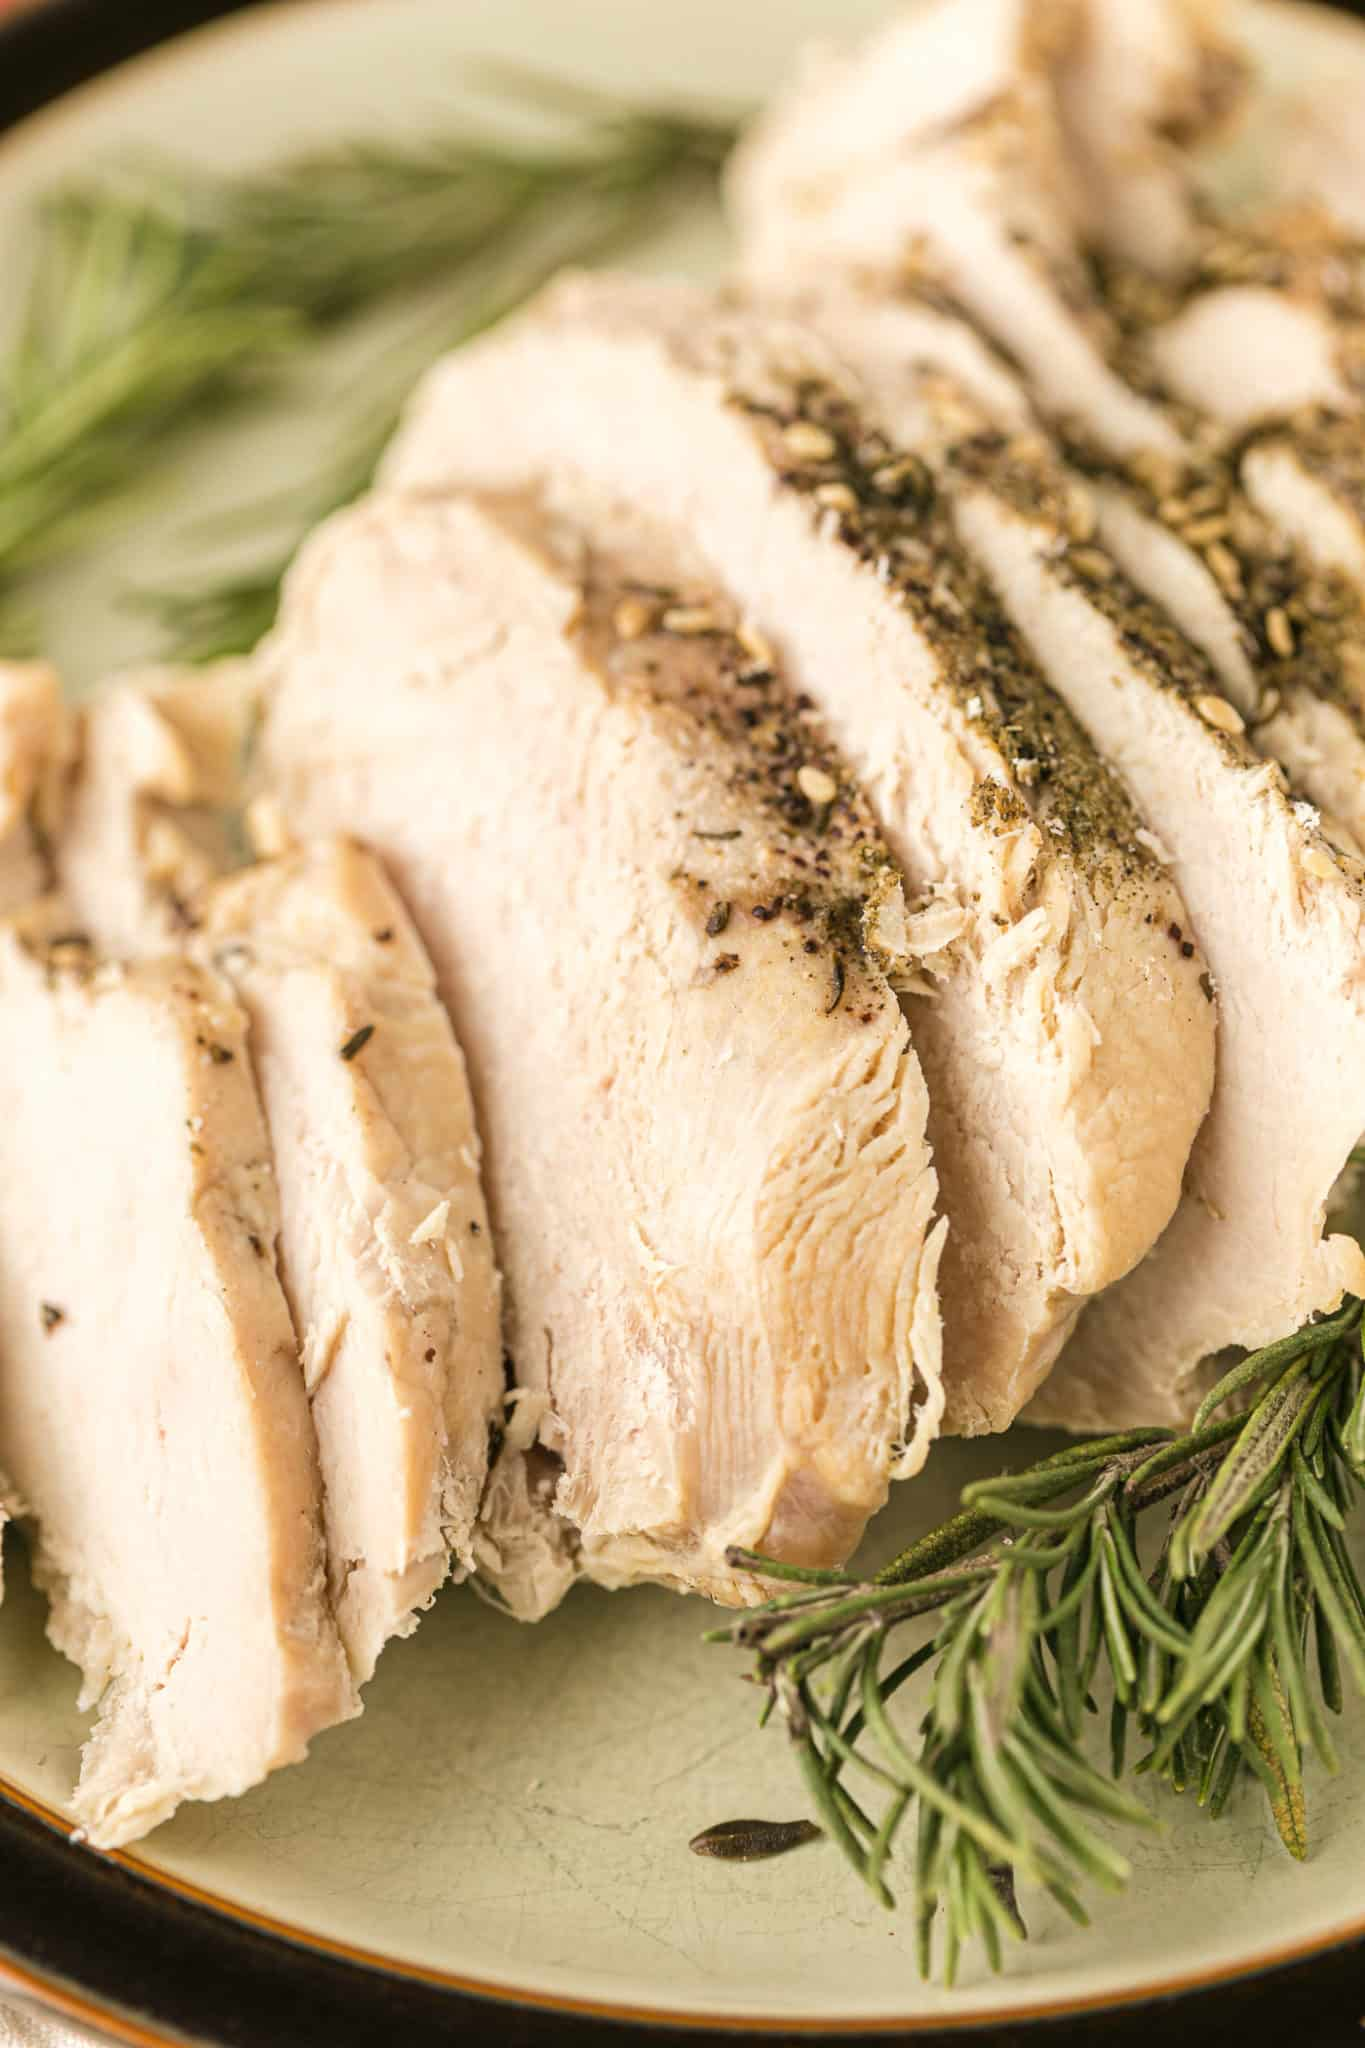 sliced boneless turkey breast served on a platter